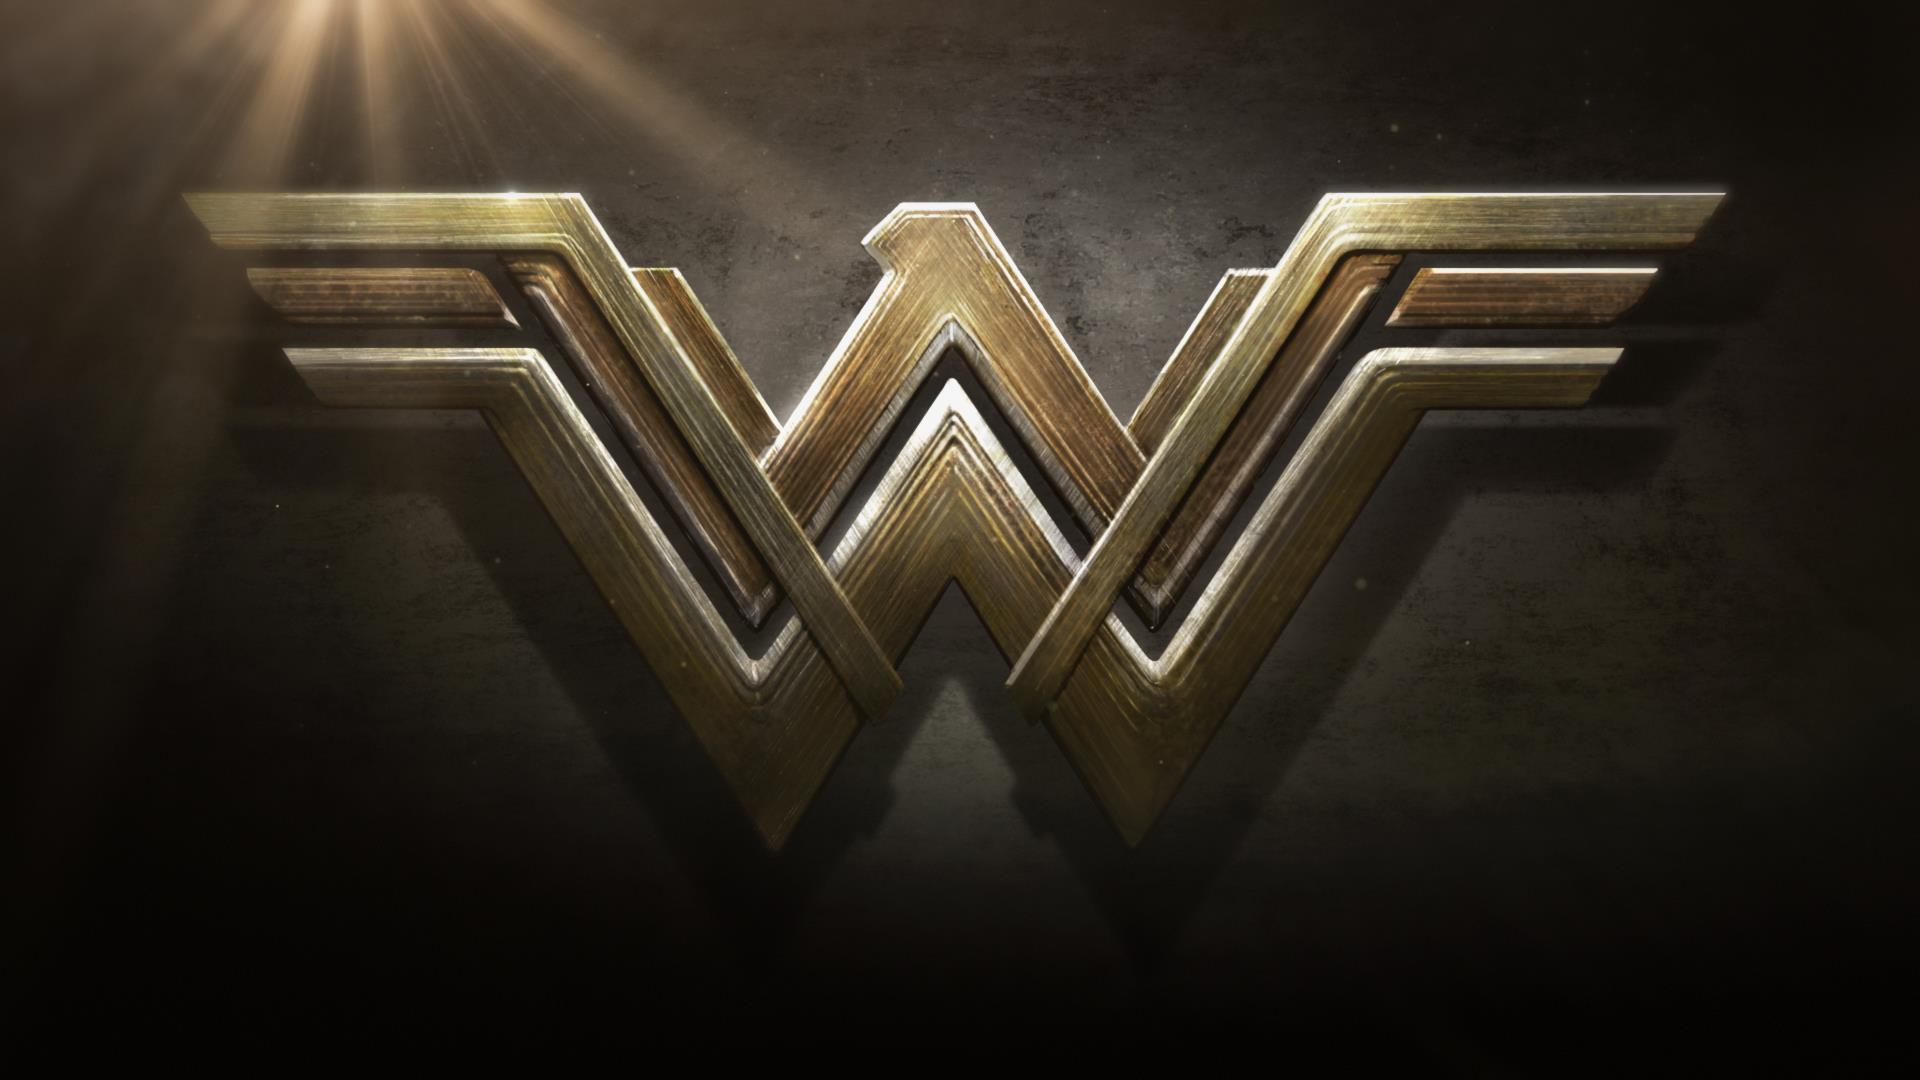 Wonder Woman 2017 Desktop Wallpaper: Fondos Wonder Woman, Wallpapers La Mujer Maravilla 2017